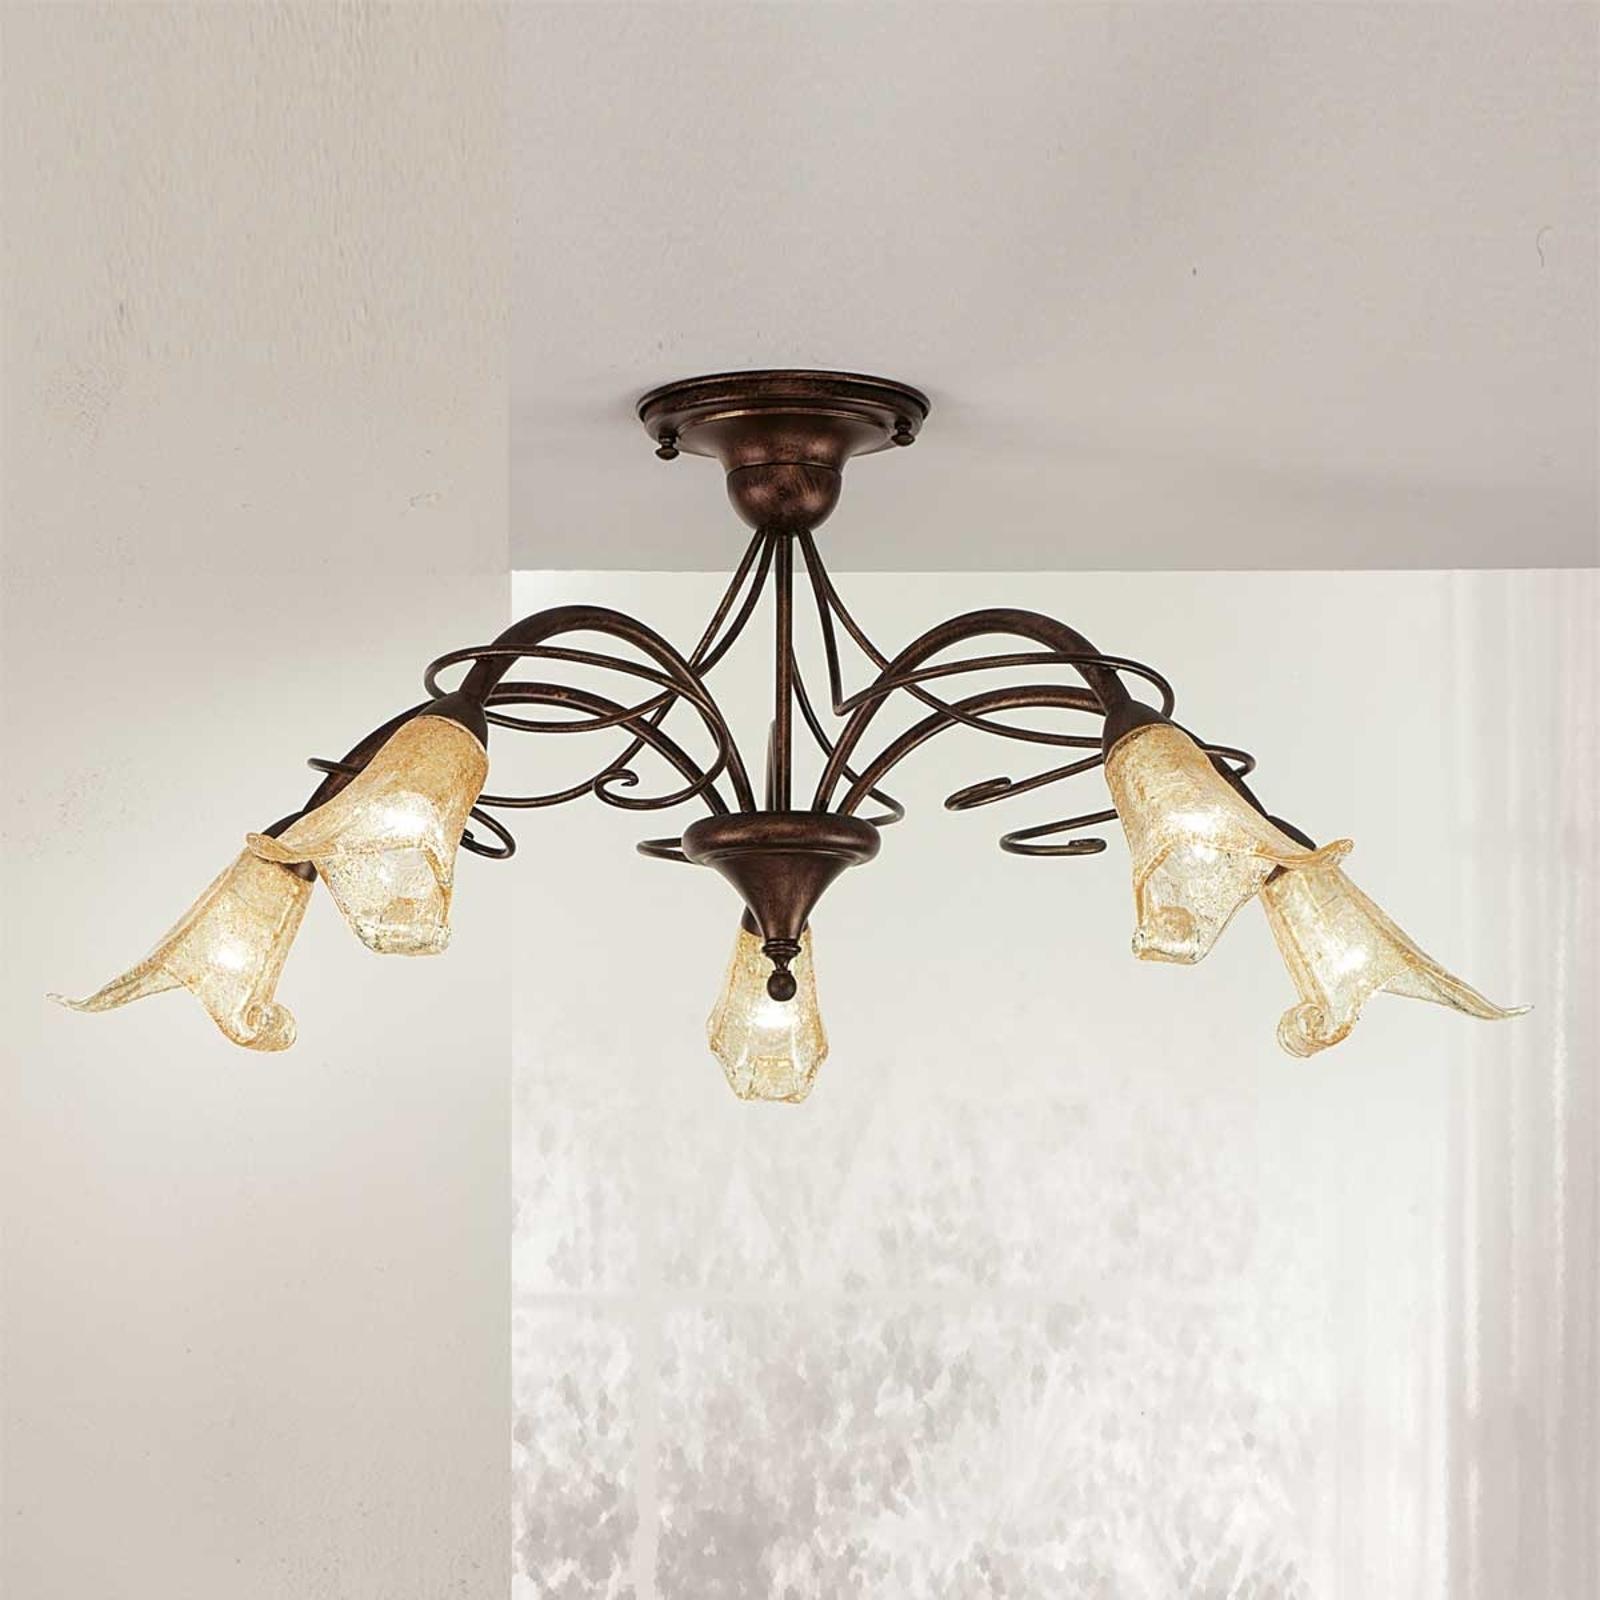 Plafondlamp RICCARDO met floraal cachet, 5-lichts